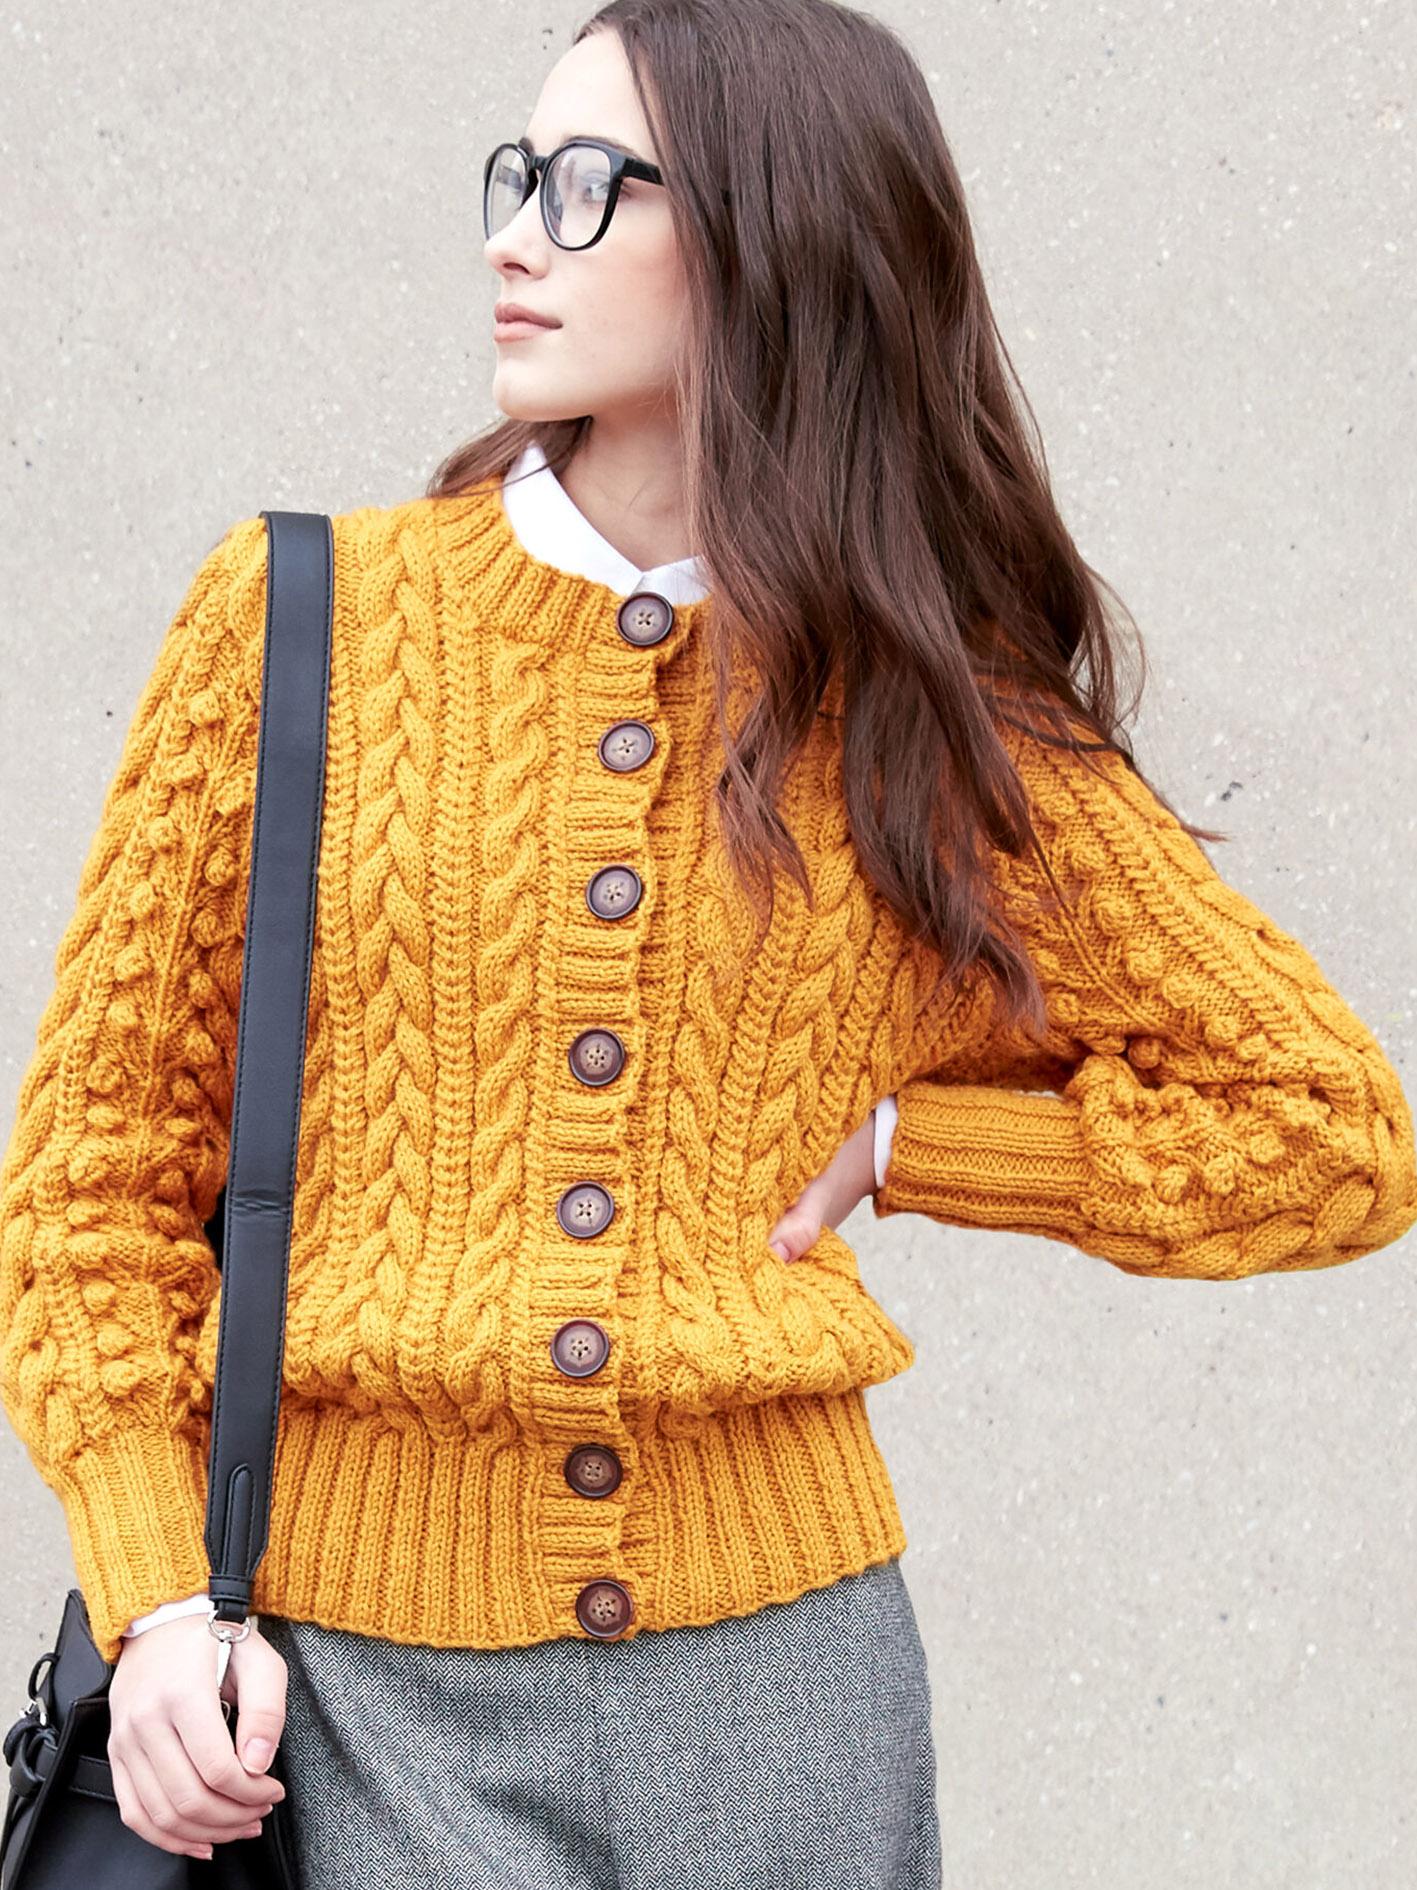 womens-best-35-friendly-free-crocheted-cardigan-ideas-2019